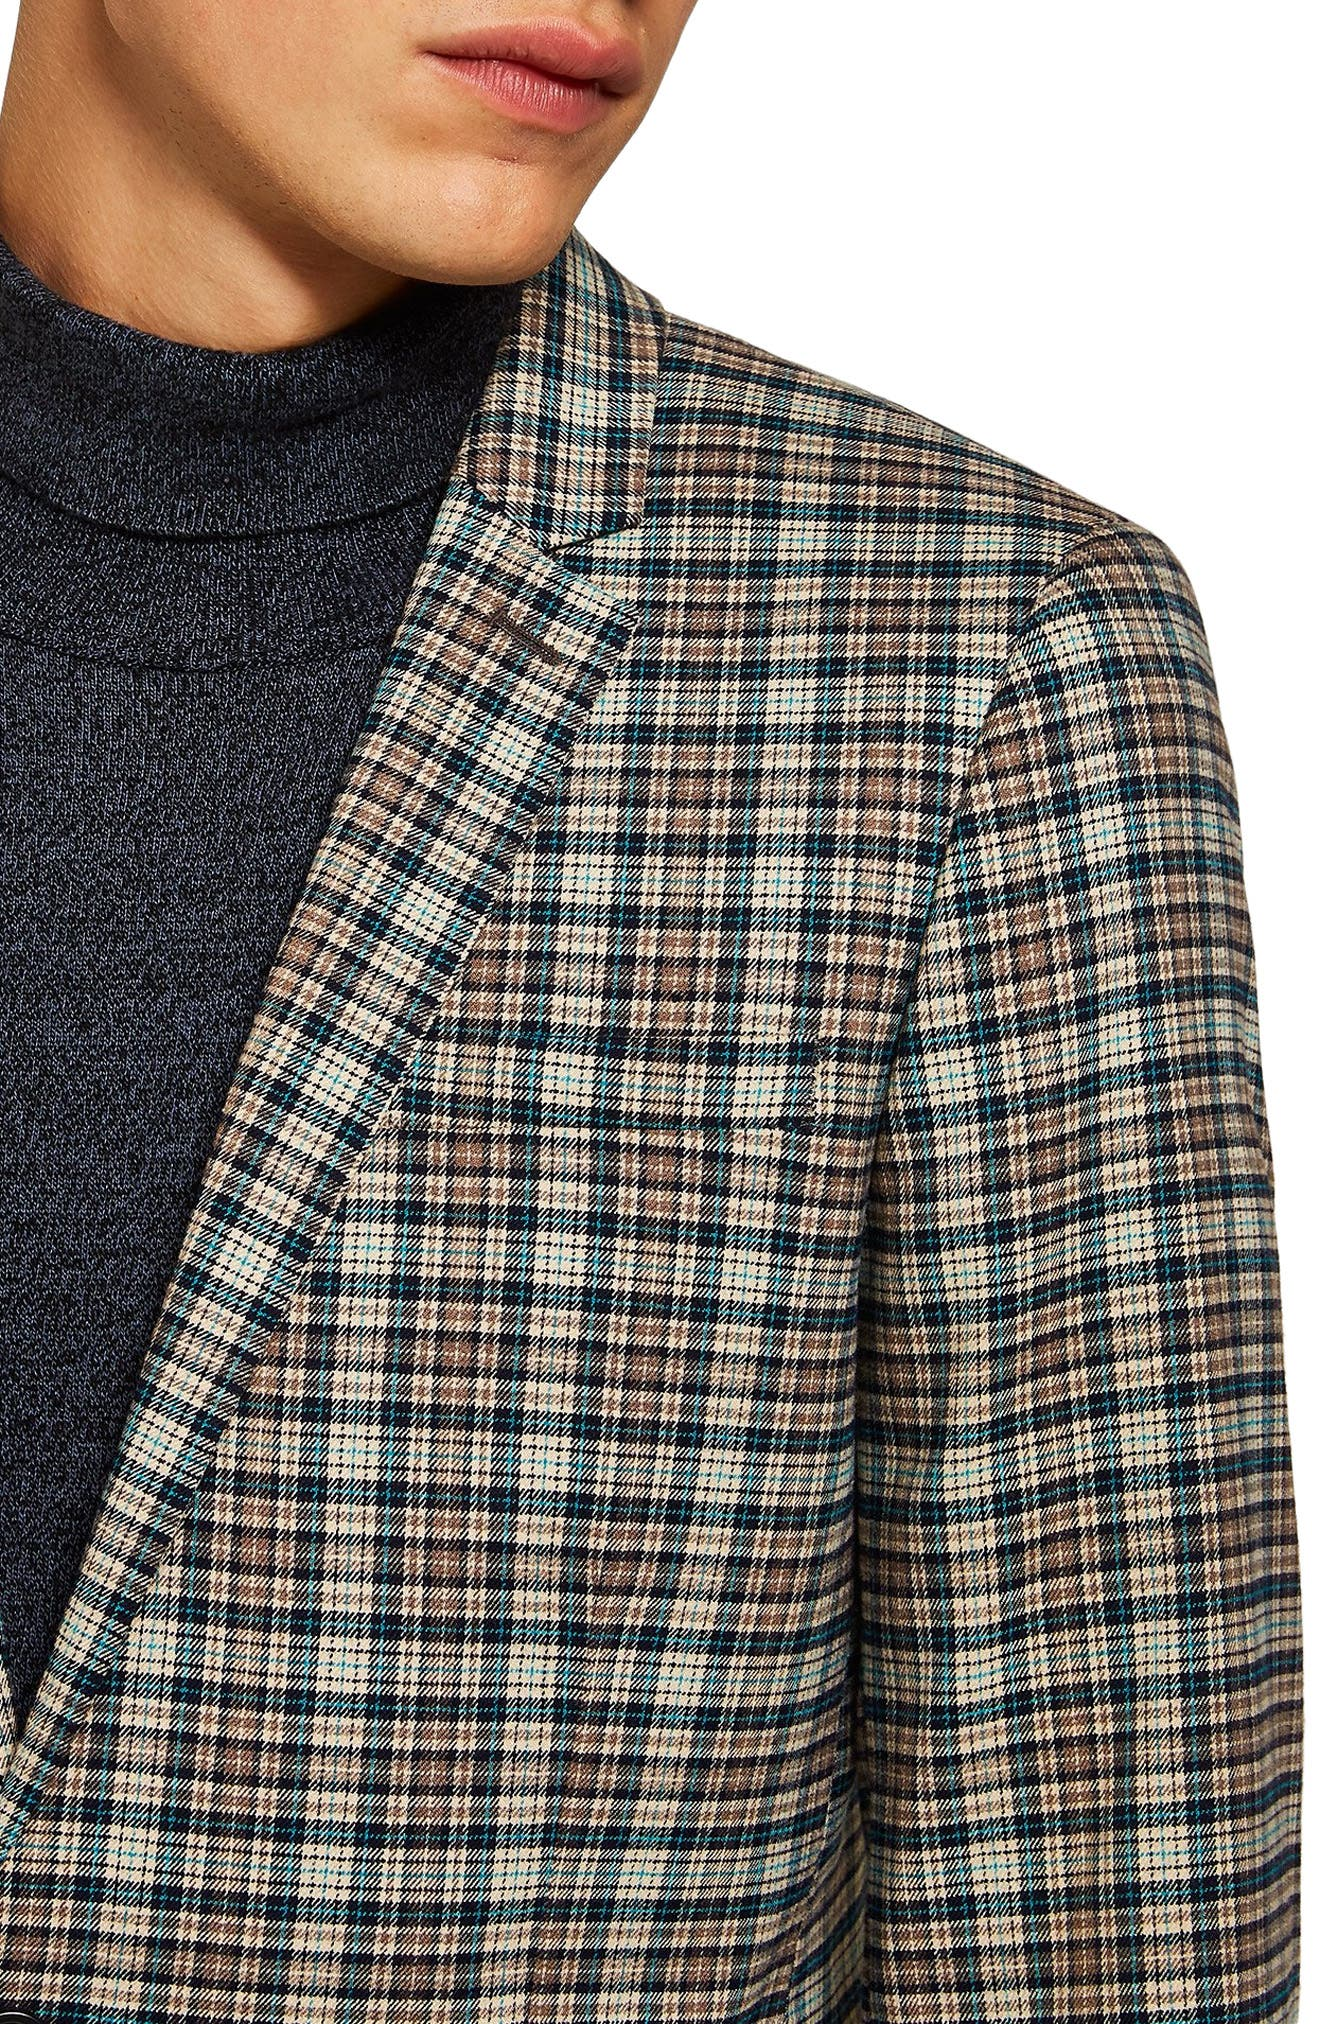 Ultra Skinny Fit Check Suit Jacket,                             Alternate thumbnail 4, color,                             BLACK MULTI